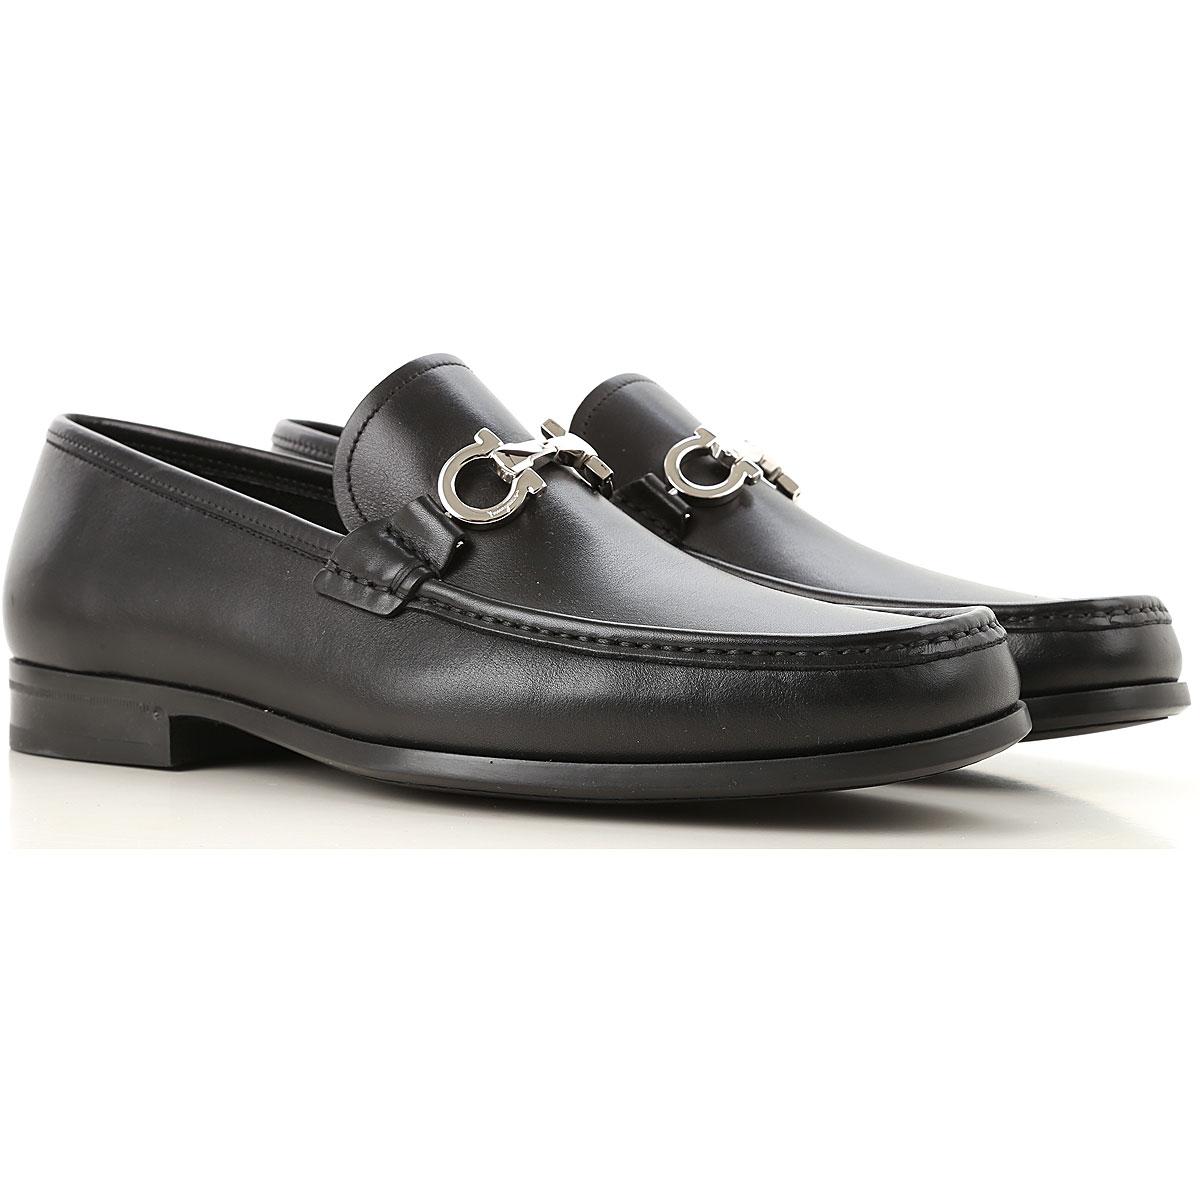 Salvatore Ferragamo Loafers for Men On Sale, Black, Leather, 2019, 7 8